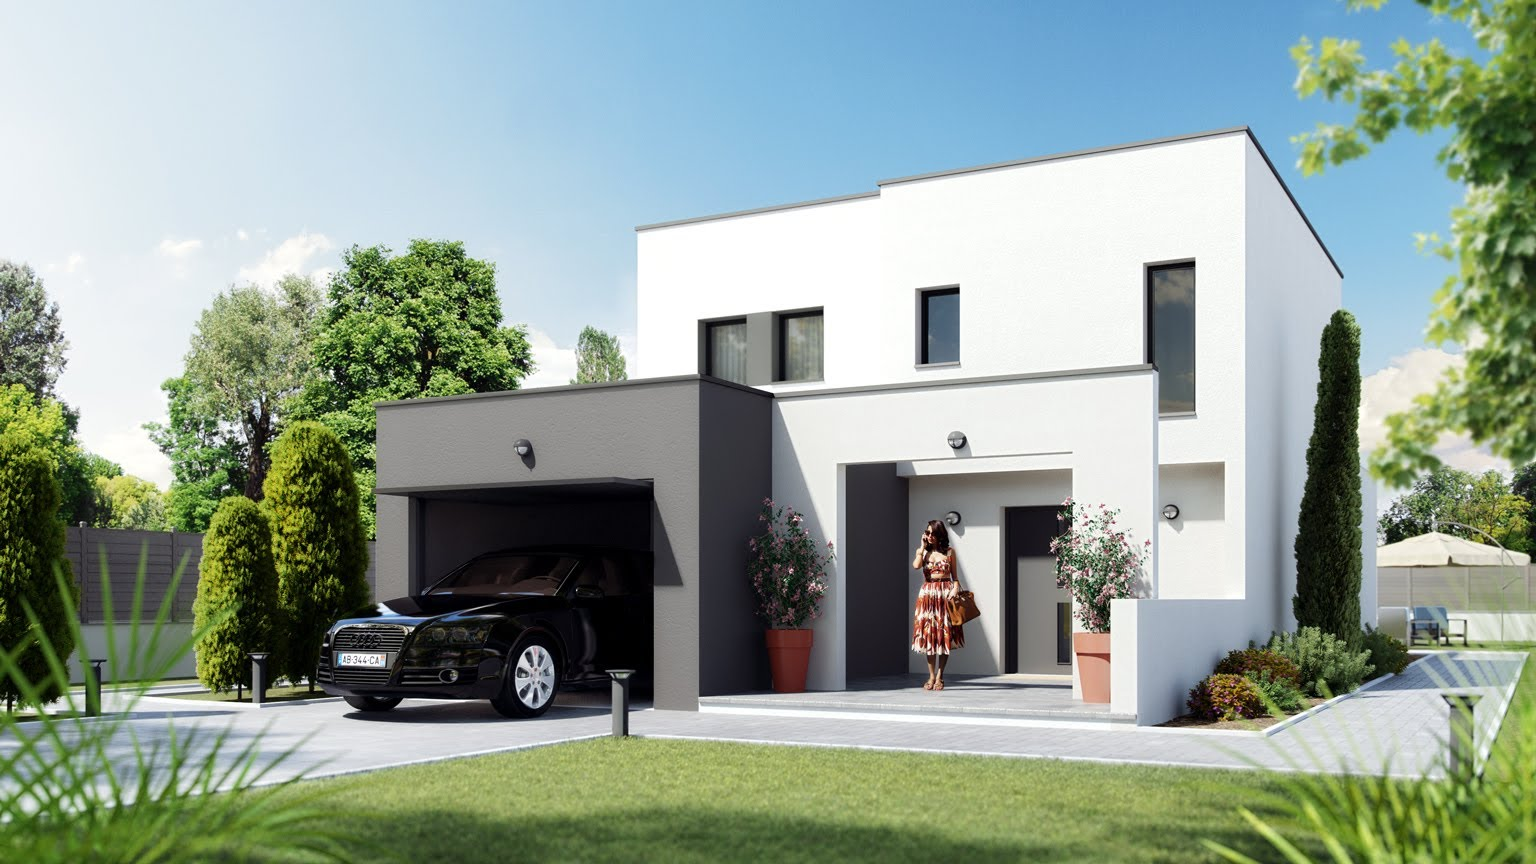 salon maison neuve - Tva Construction Maison Neuve